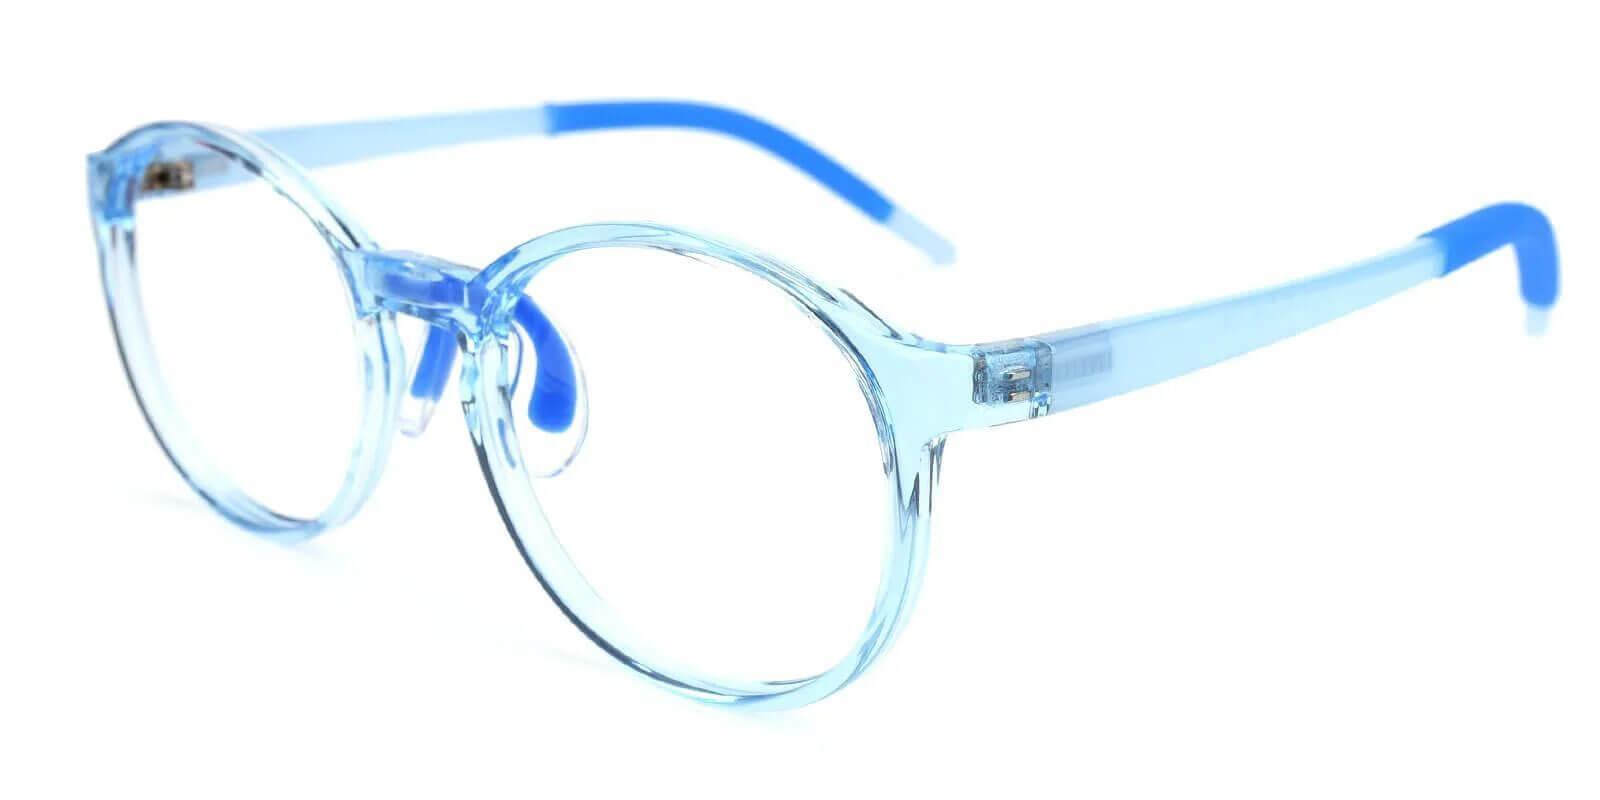 Kids-Billy Translucent TR Eyeglasses , Lightweight , NosePads Frames from ABBE Glasses